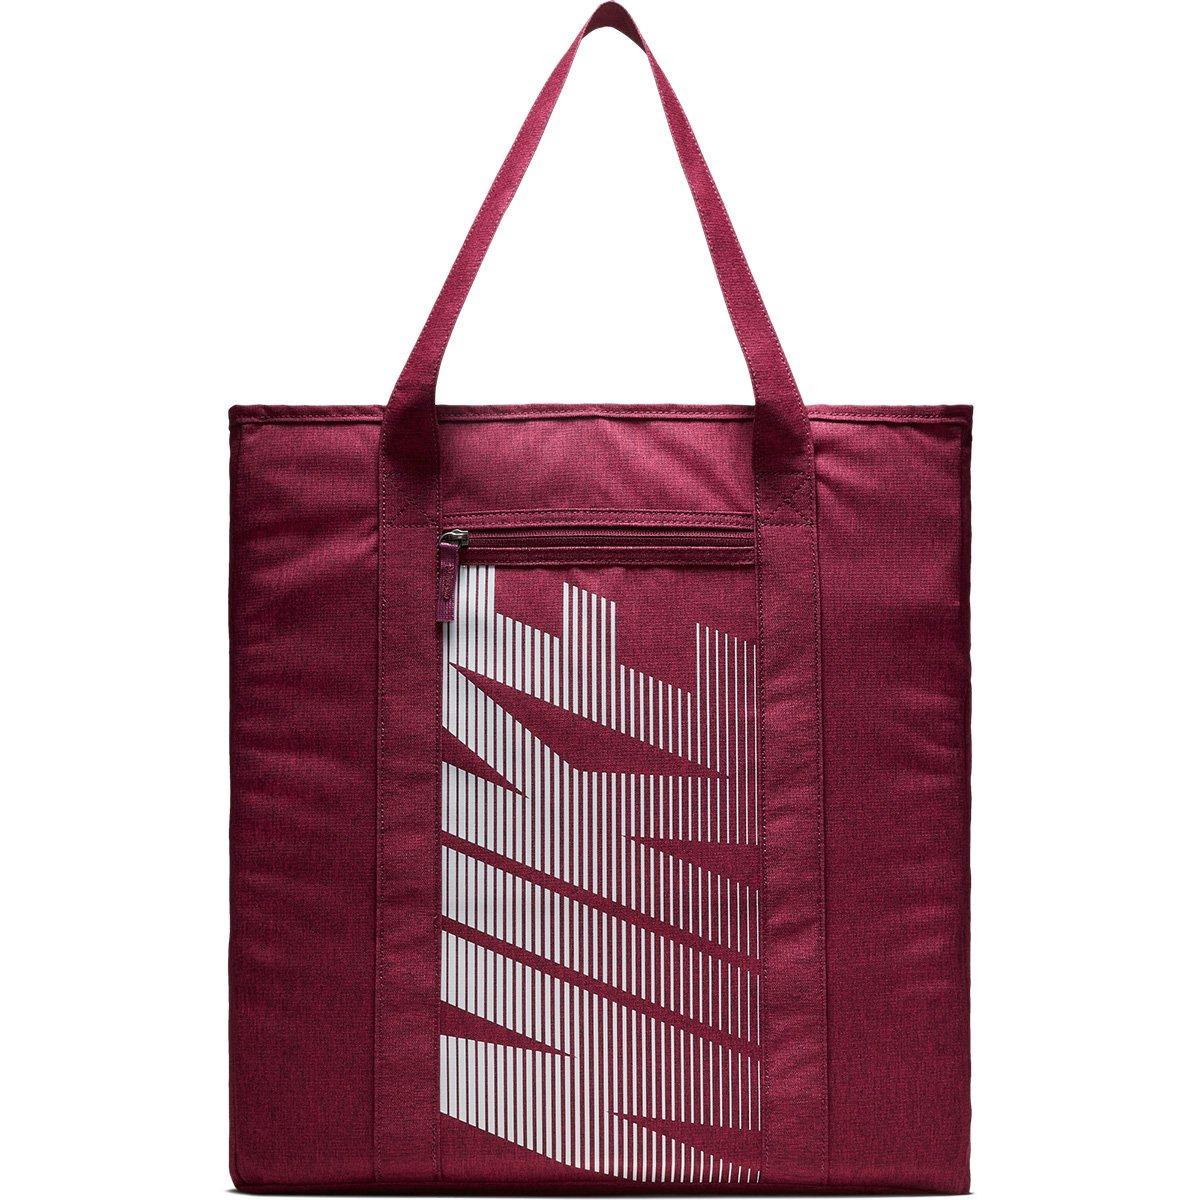 0bc6ca552 Bolsa Nike Gym Tote Feminina - Rosa Escuro   Netshoes